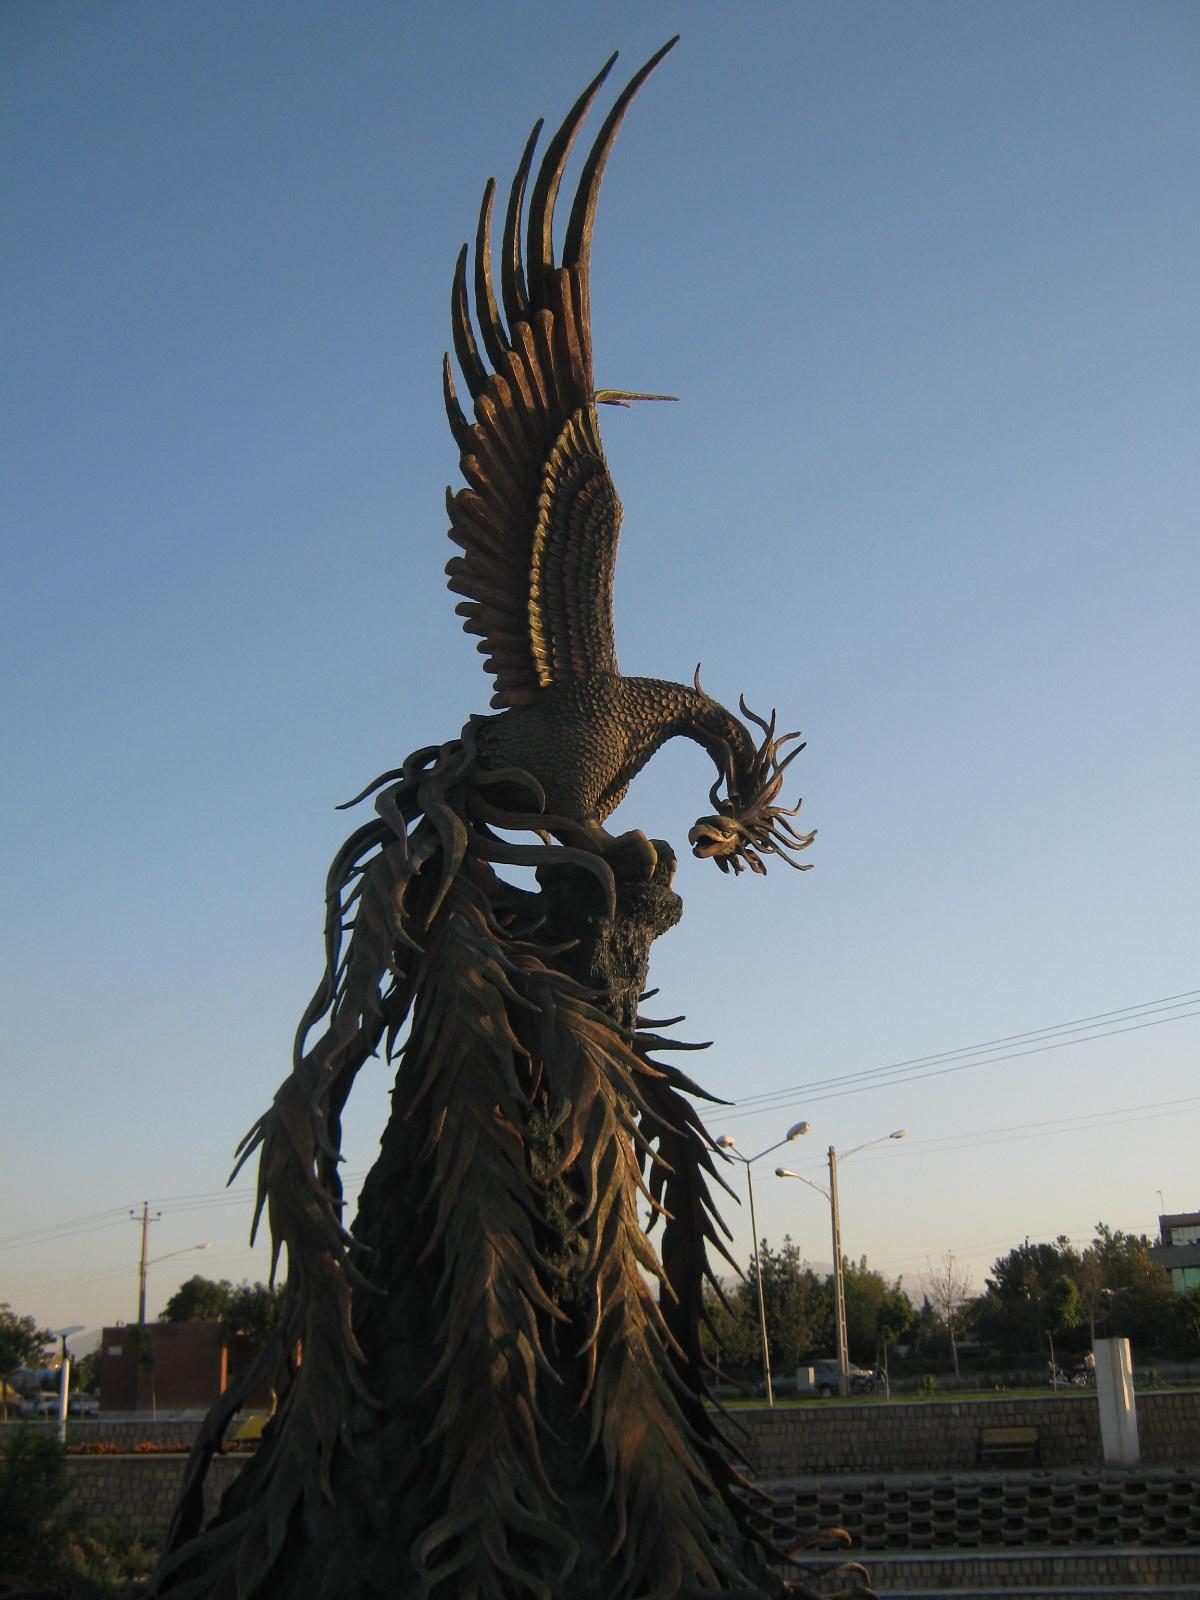 Simorgh_statue_-_morning_-_Nishapur_4